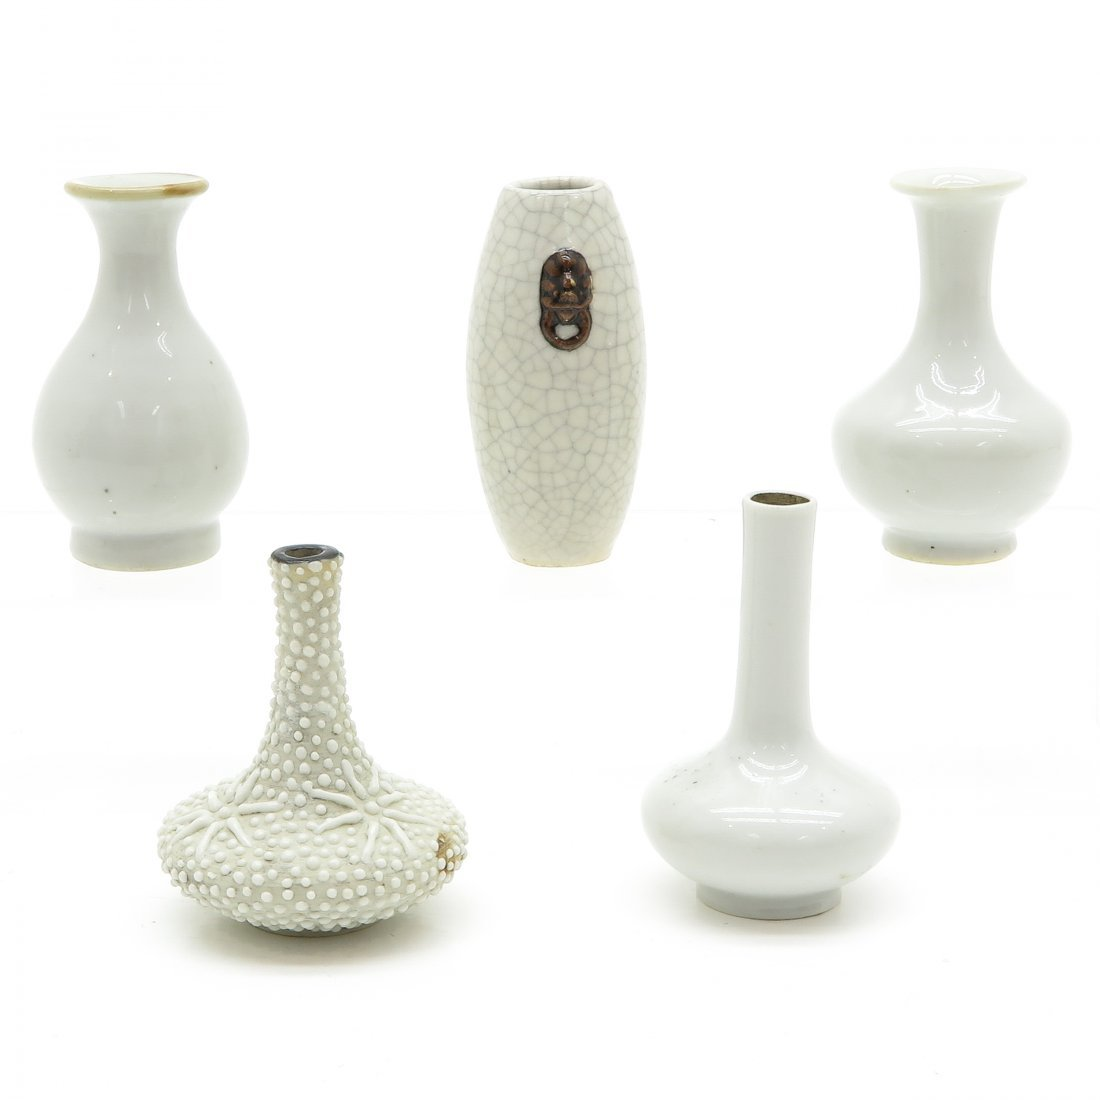 Lot of 5 China Porcelain Miniature Vases - 4